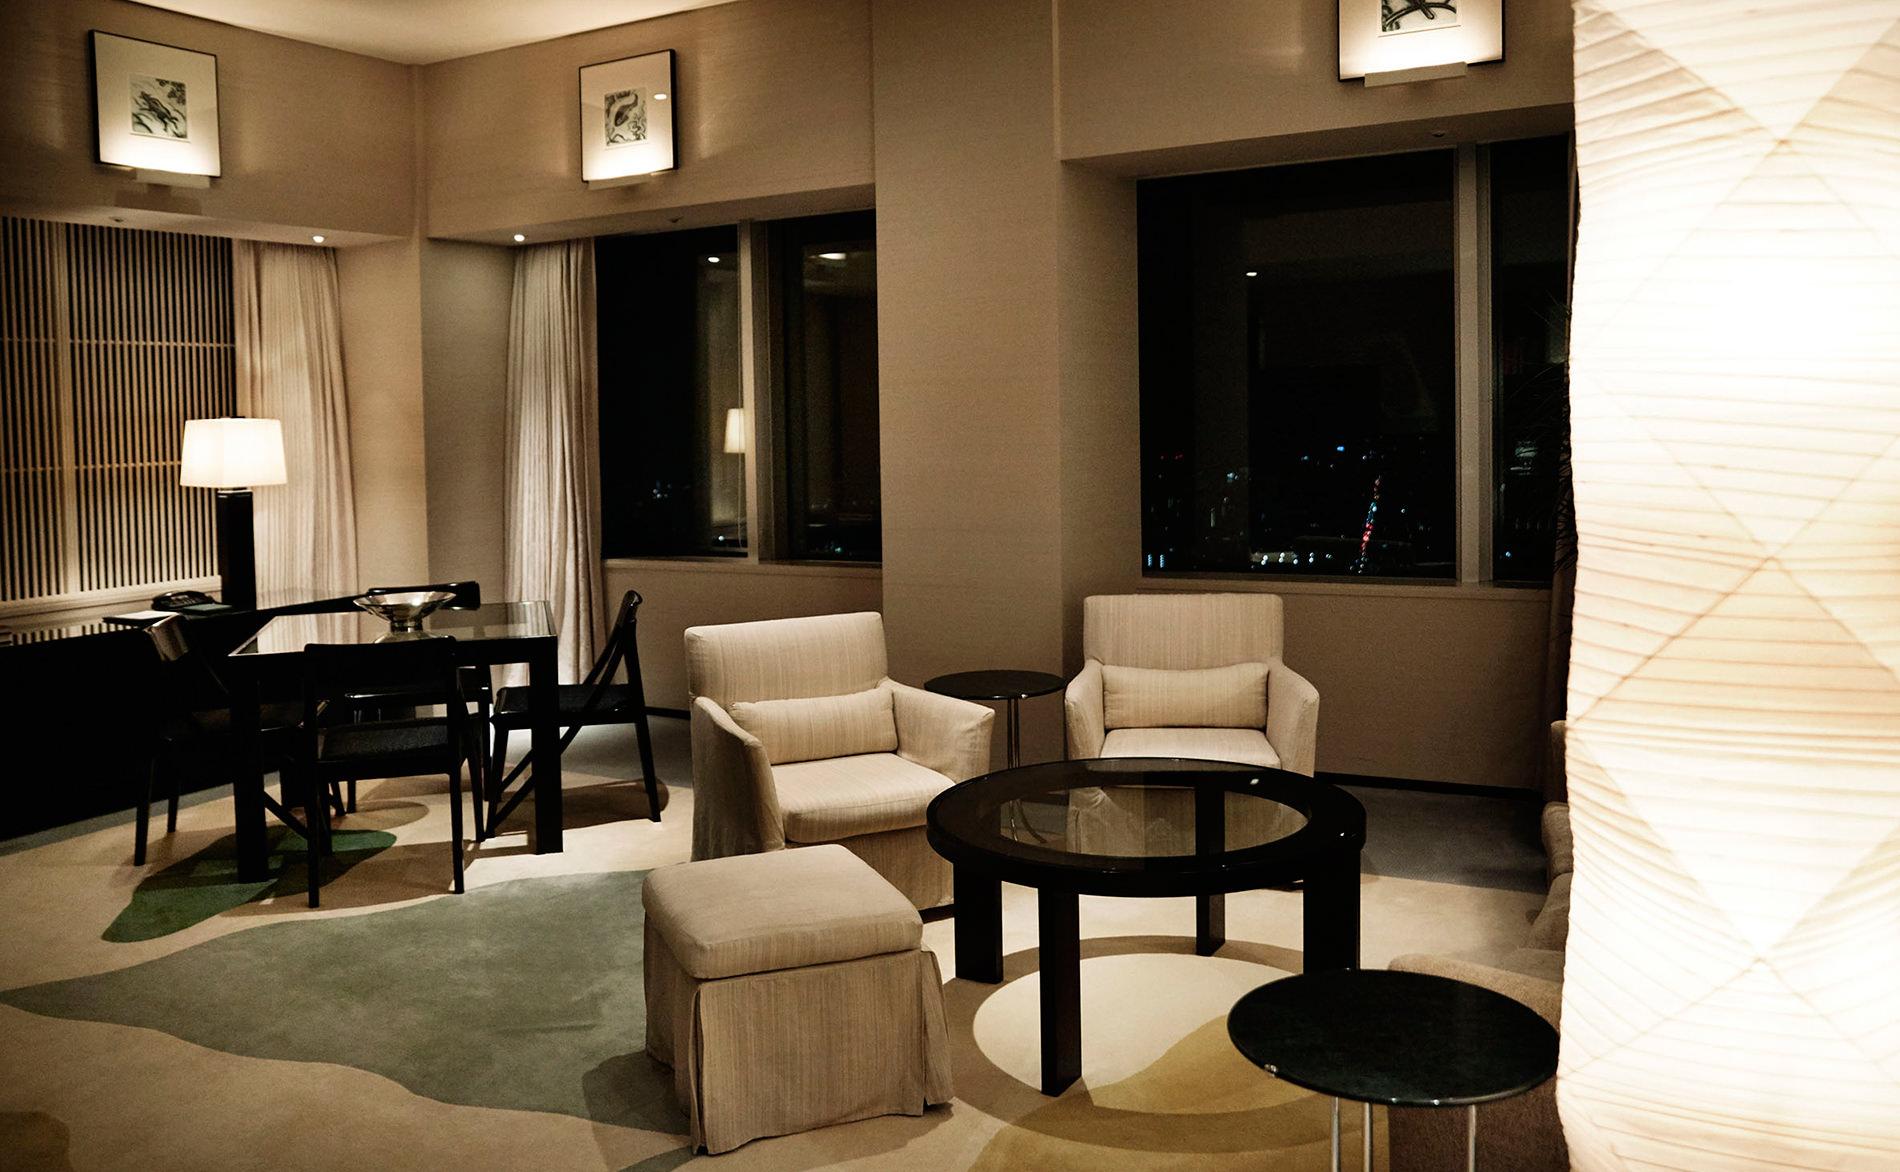 Park Suite Rooms Hyatt Tokyo